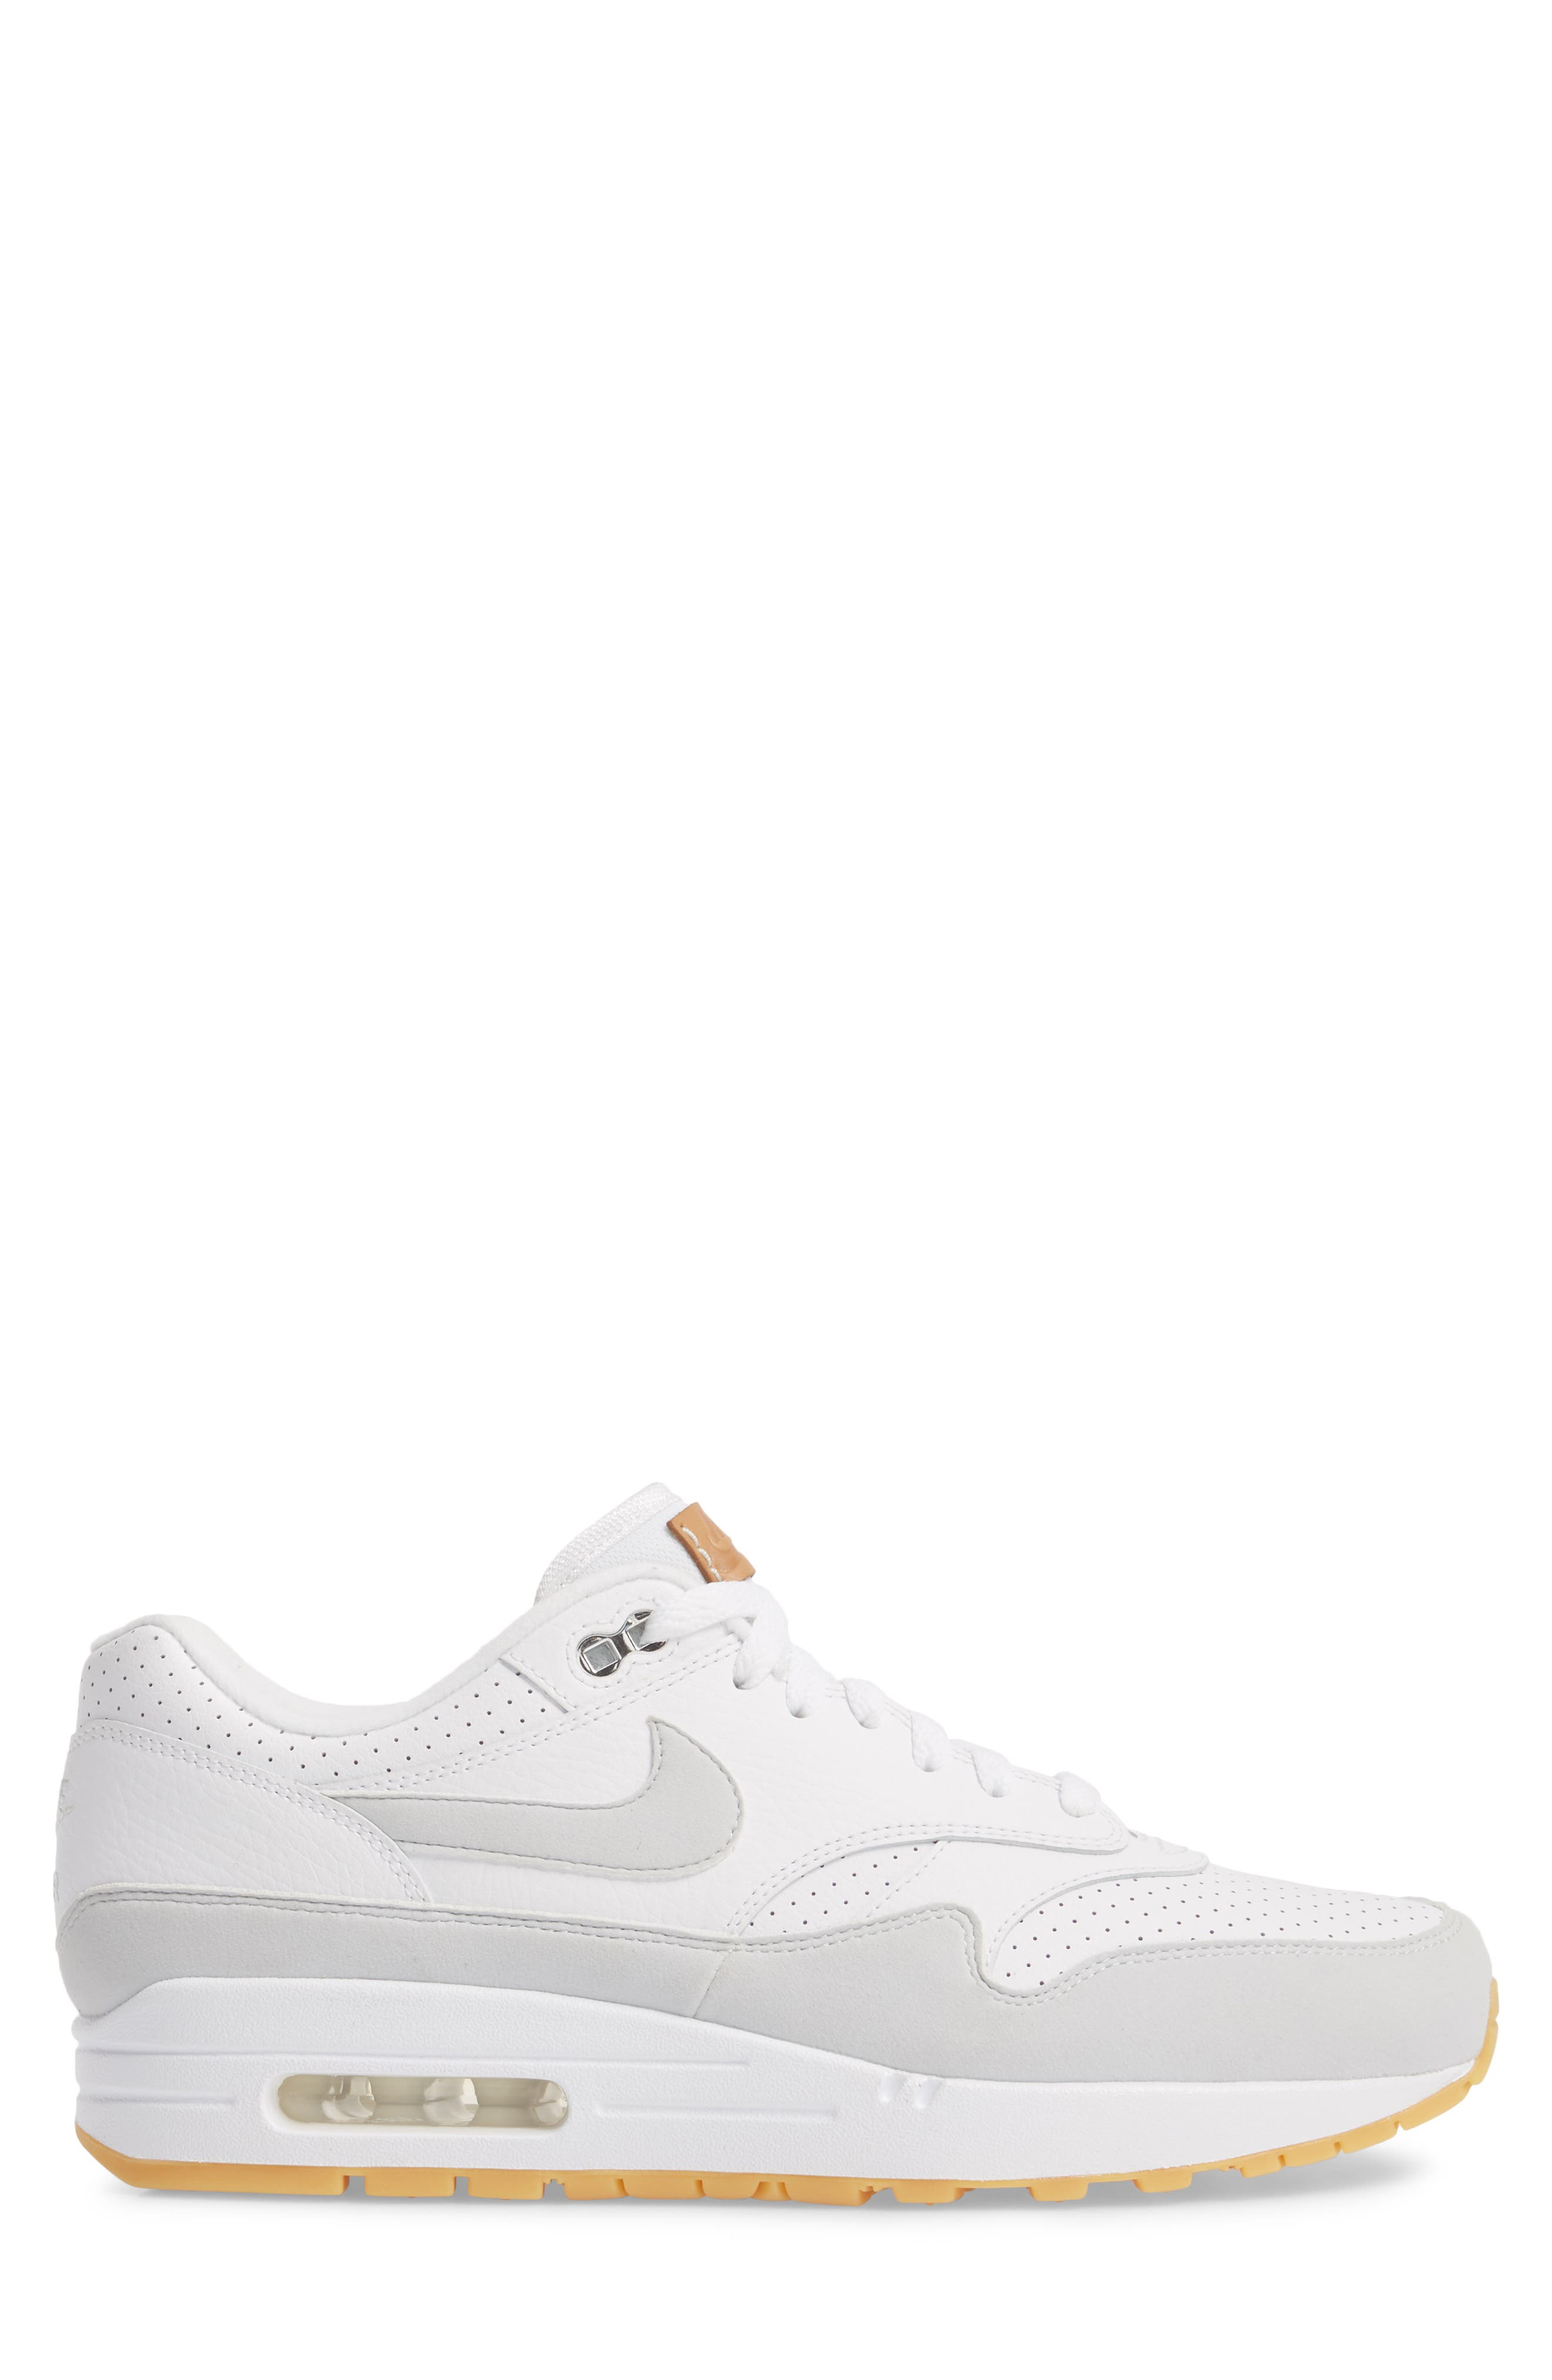 Air Max 1 Sneaker,                             Alternate thumbnail 3, color,                             White/ Pure Platinum/ Yellow